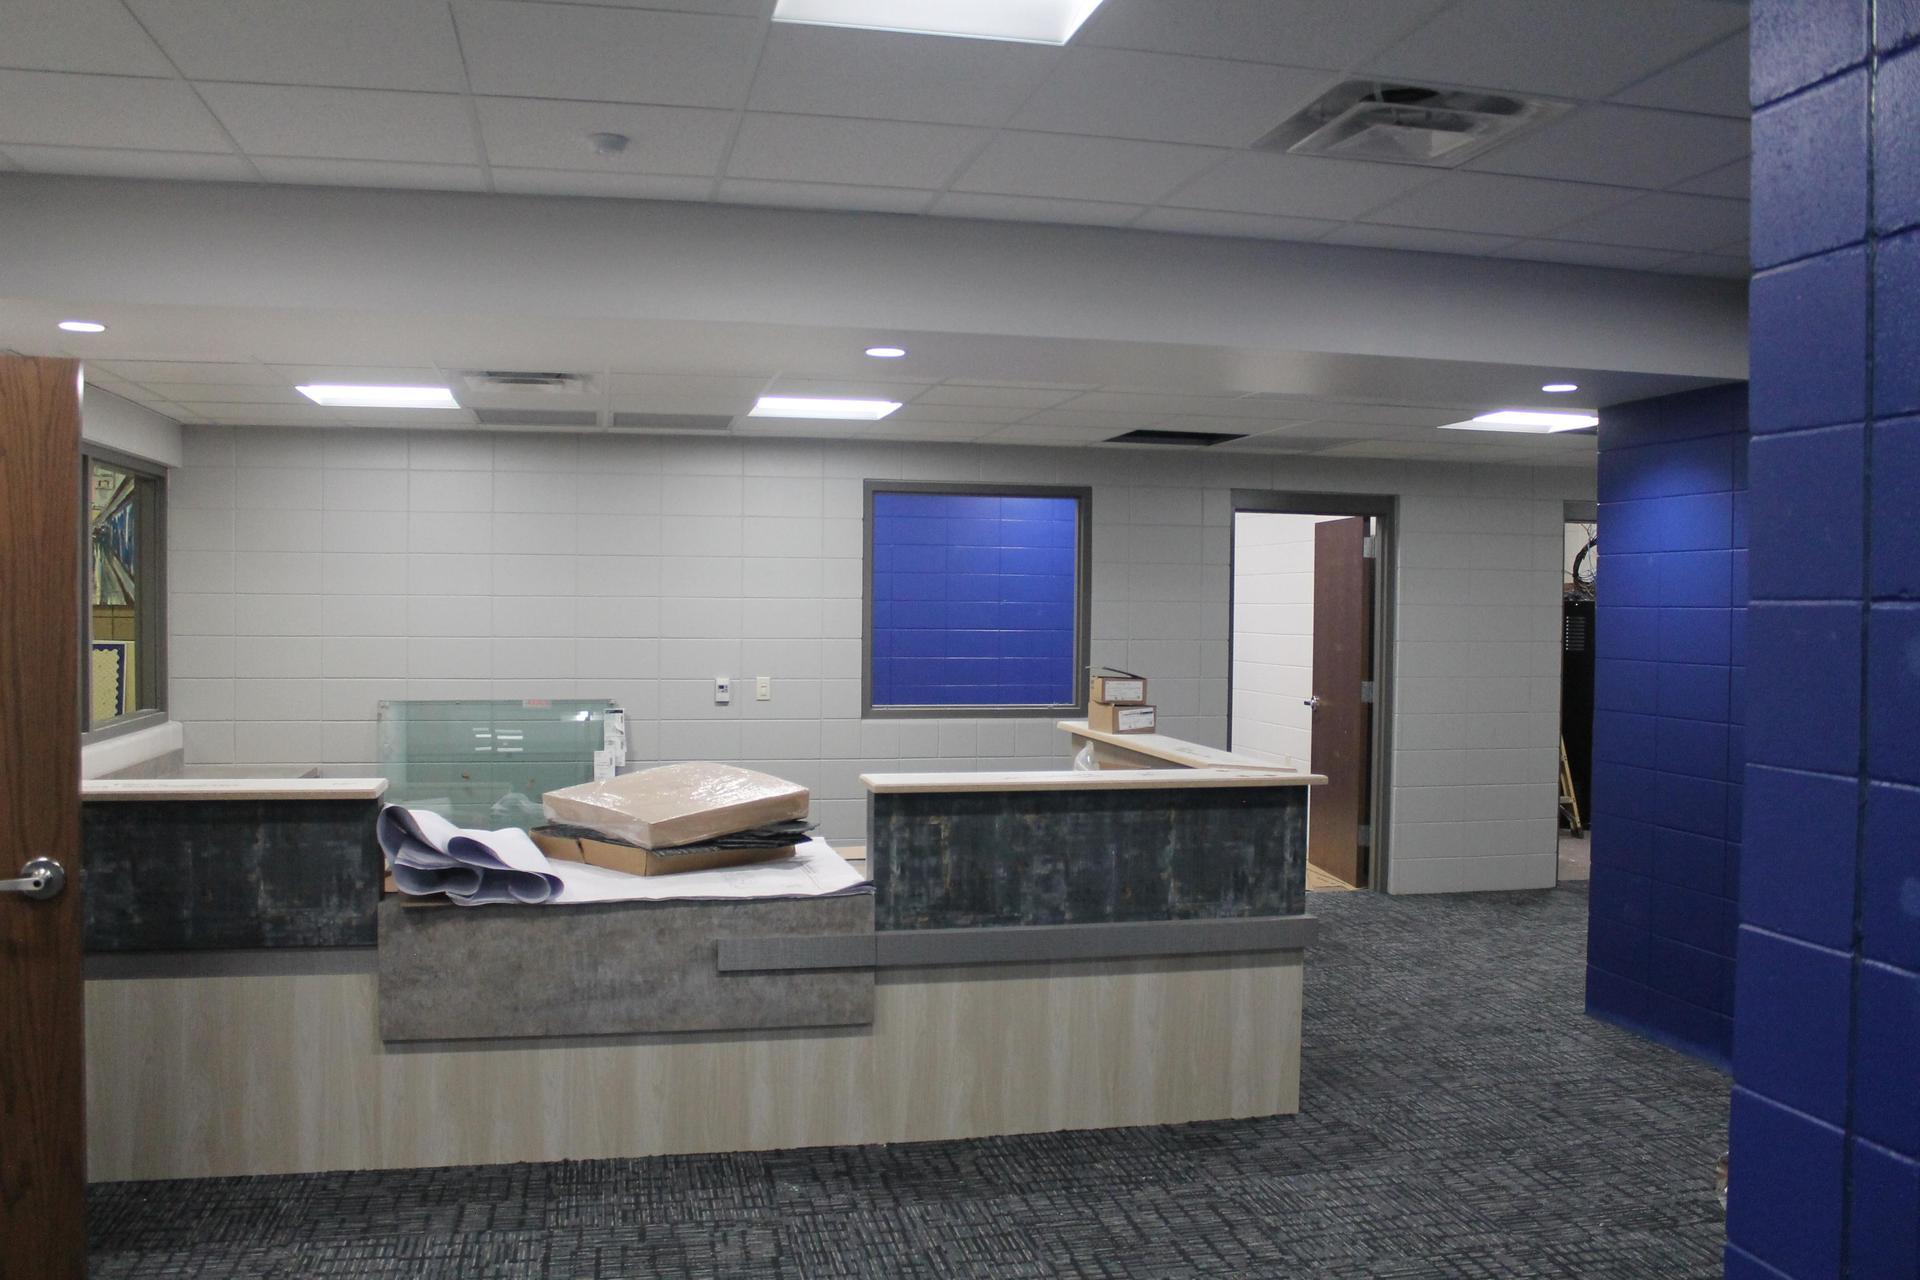 6-12 office